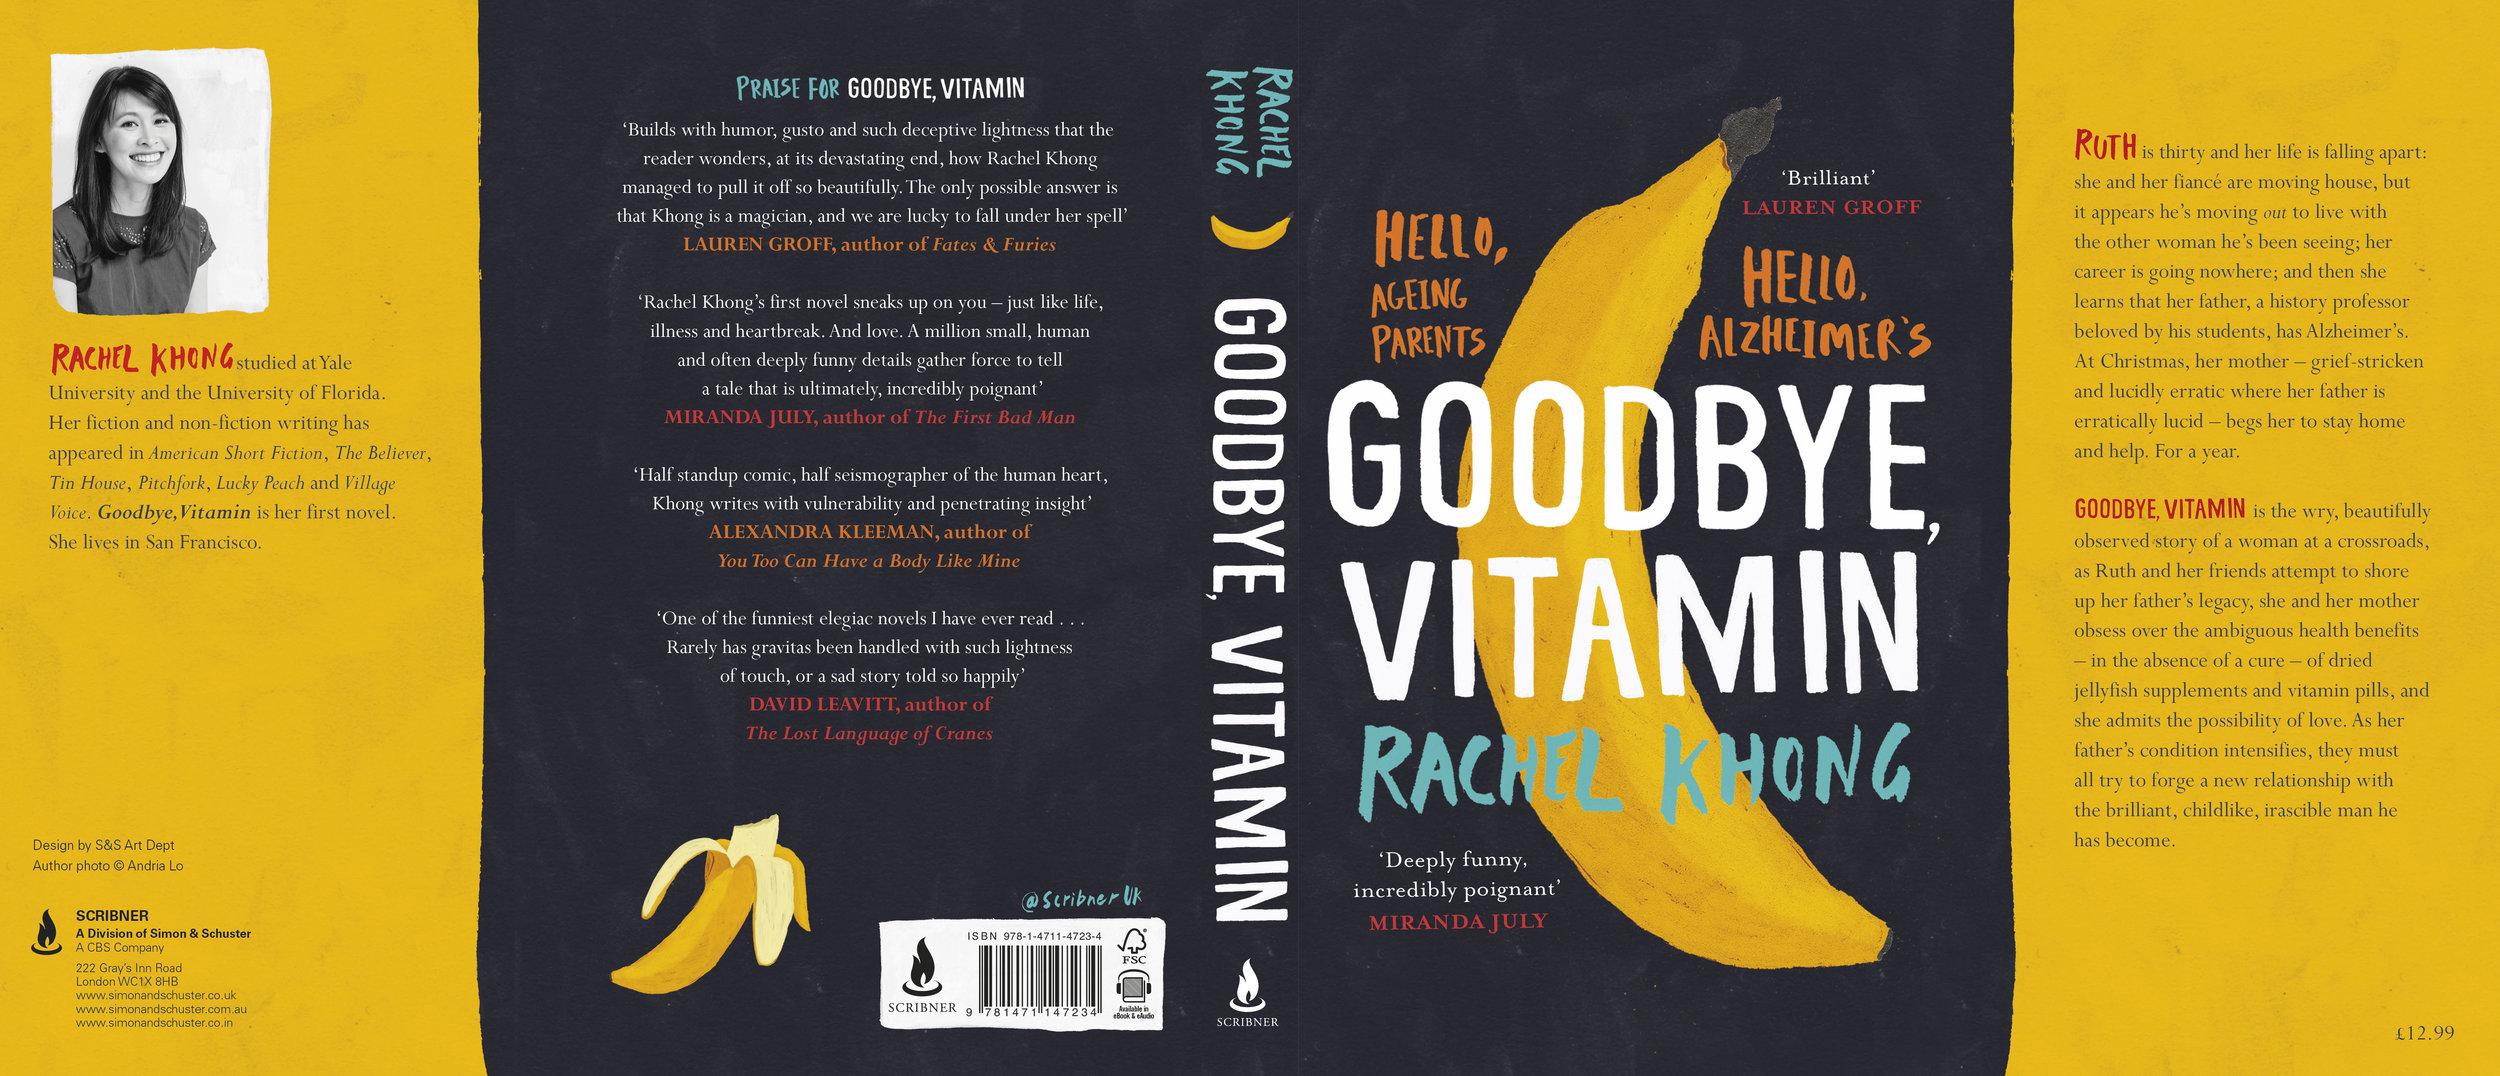 Goodbye Vitamin HBD.jpg